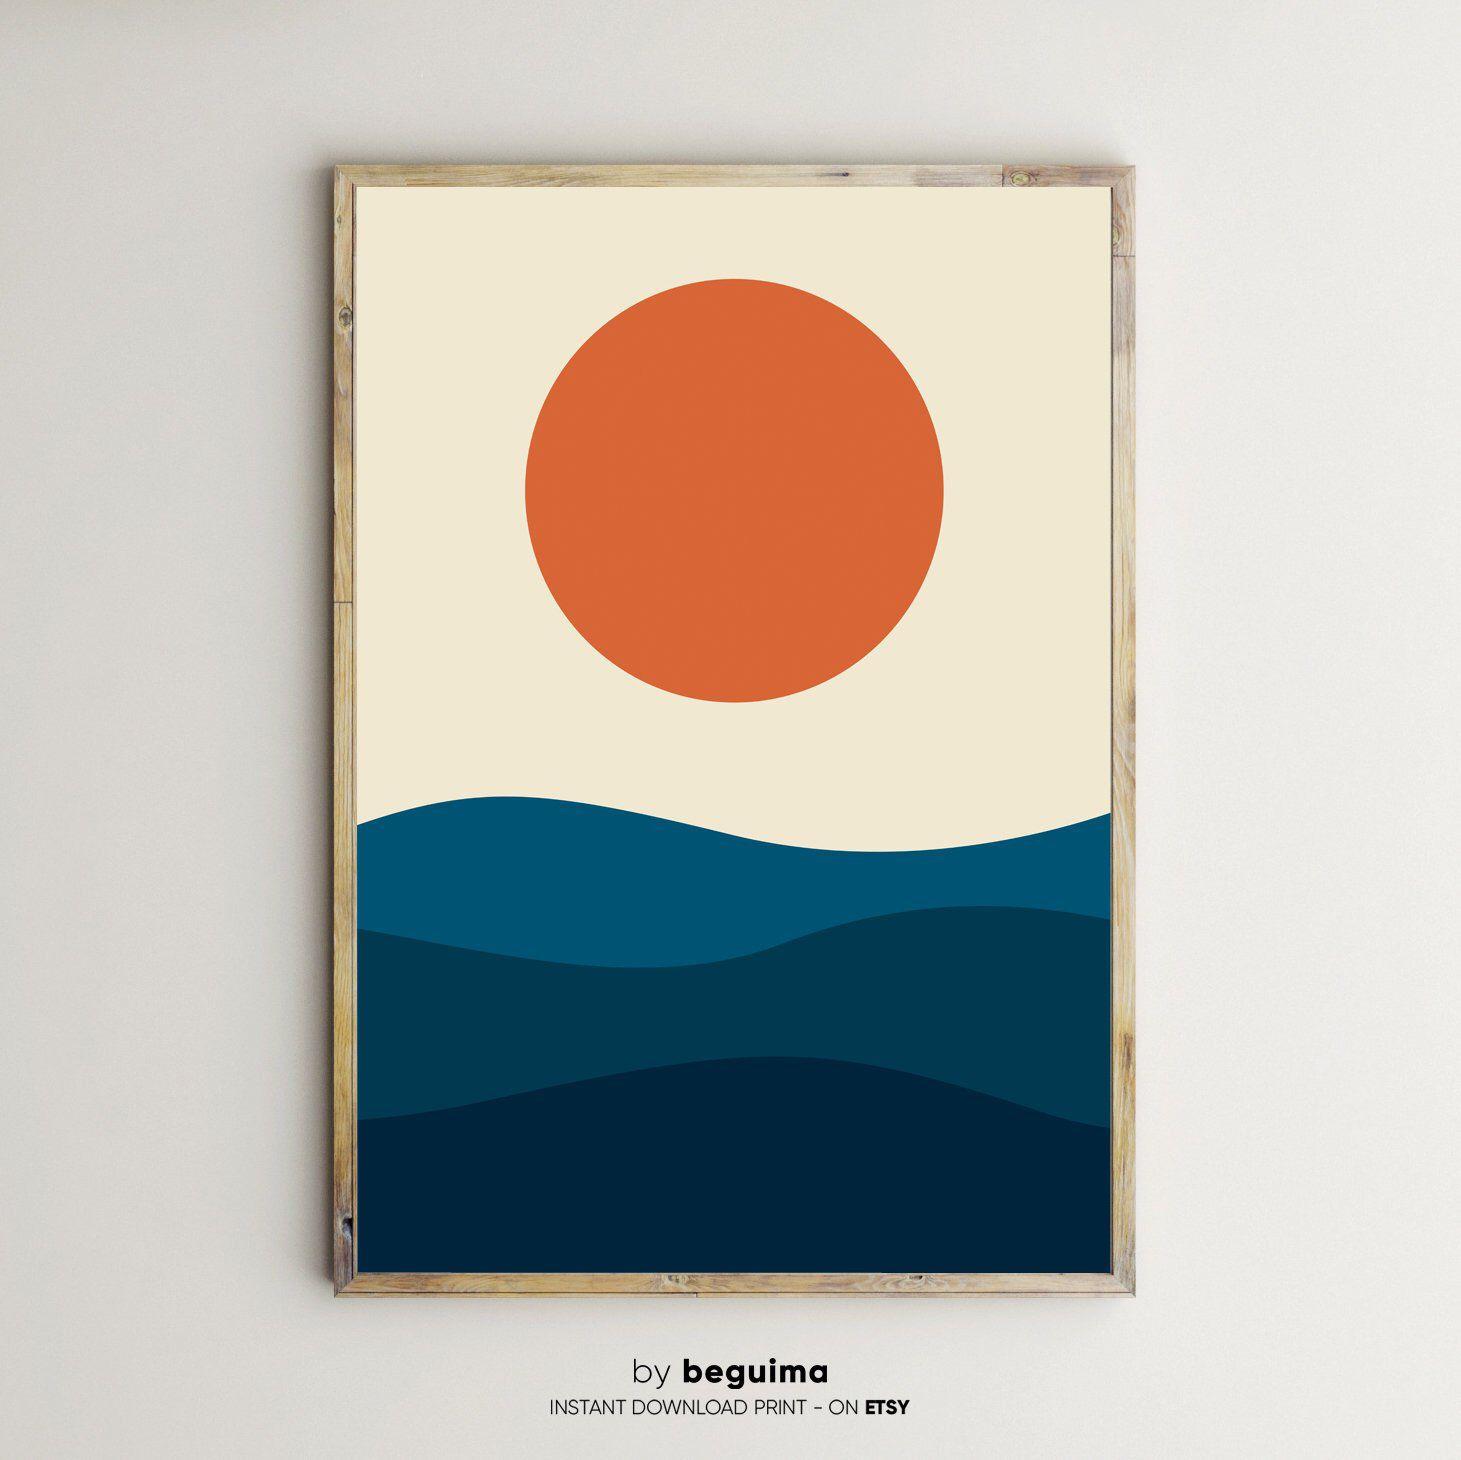 Sunset Sunrise Geometric Landscape Sea Prints Printable Wall Art Ocean Print Large Poster Home Decor Waves Graphic Design Digital Download Abstracte Tekeningen Kunst Ideeen Zeefdruk